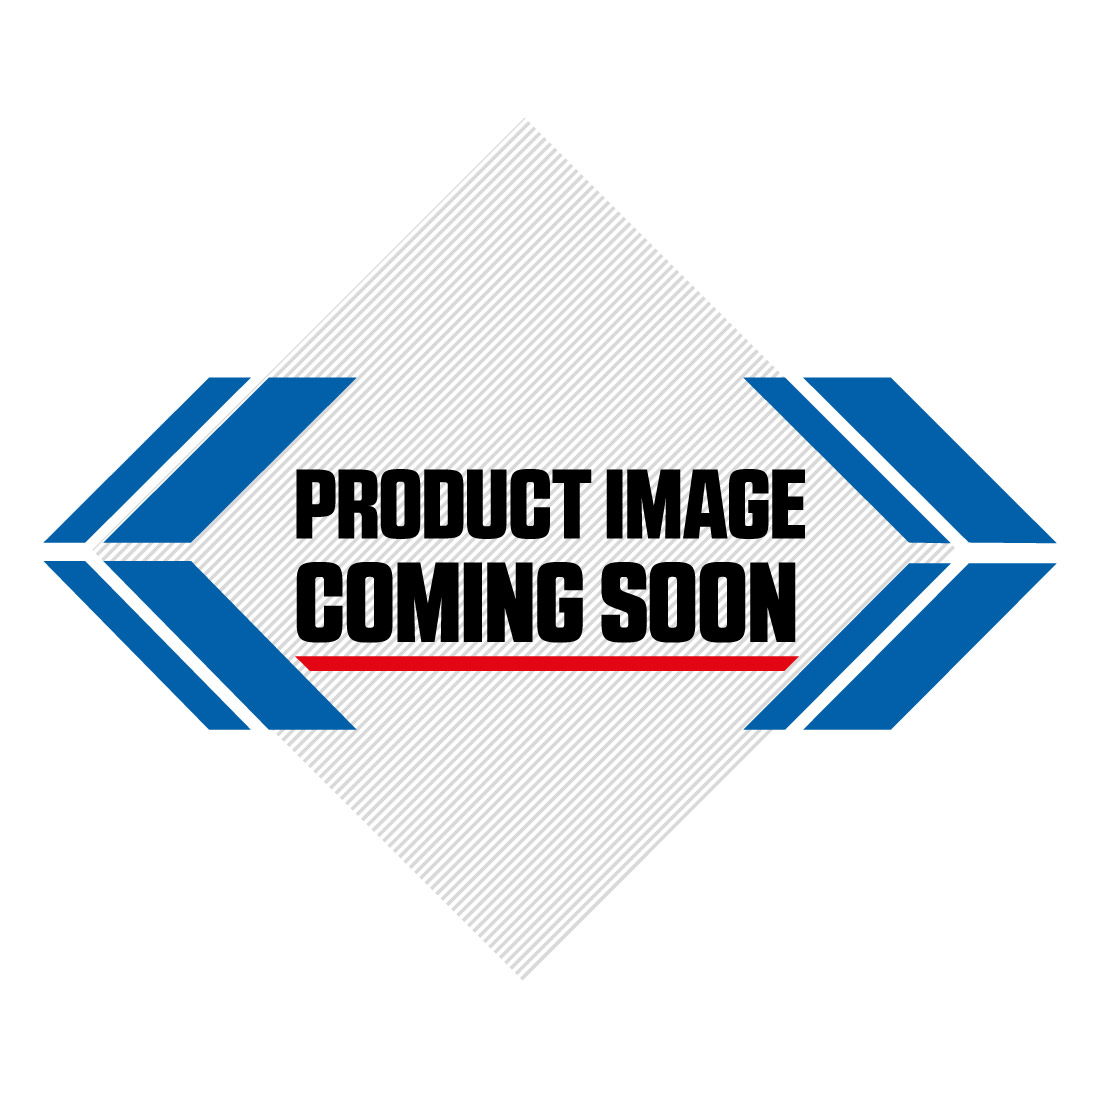 Kawasaki Restyled Plastic Kit KX 85 (2010) OEM Factory Image-1>